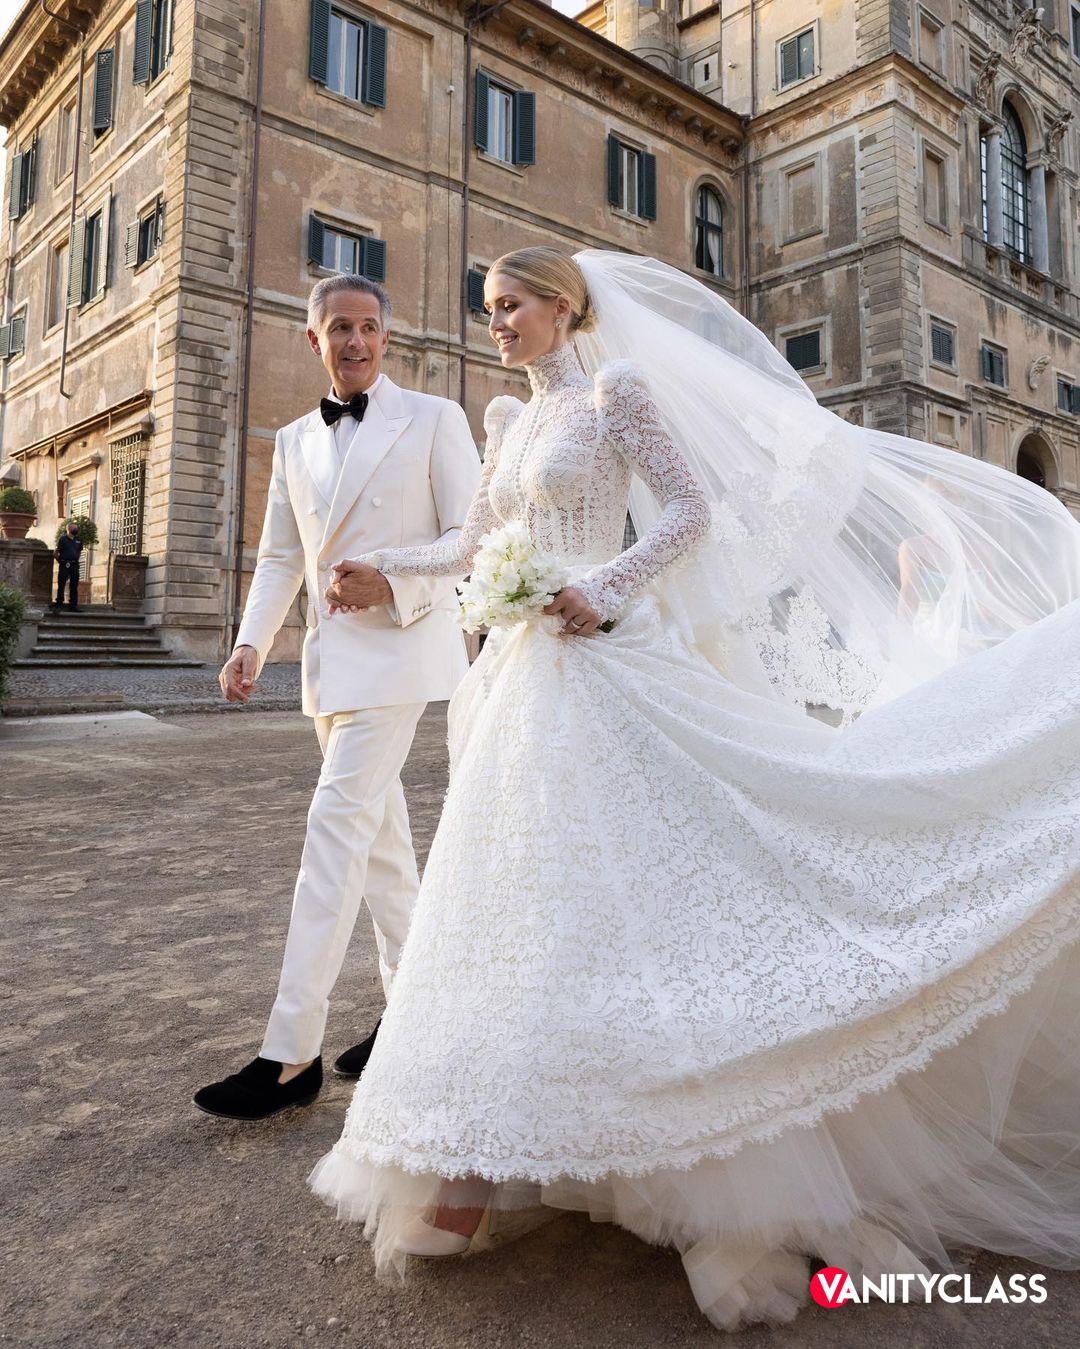 Il matrimonio di Lady Kitty Spencer e Michael Lewis